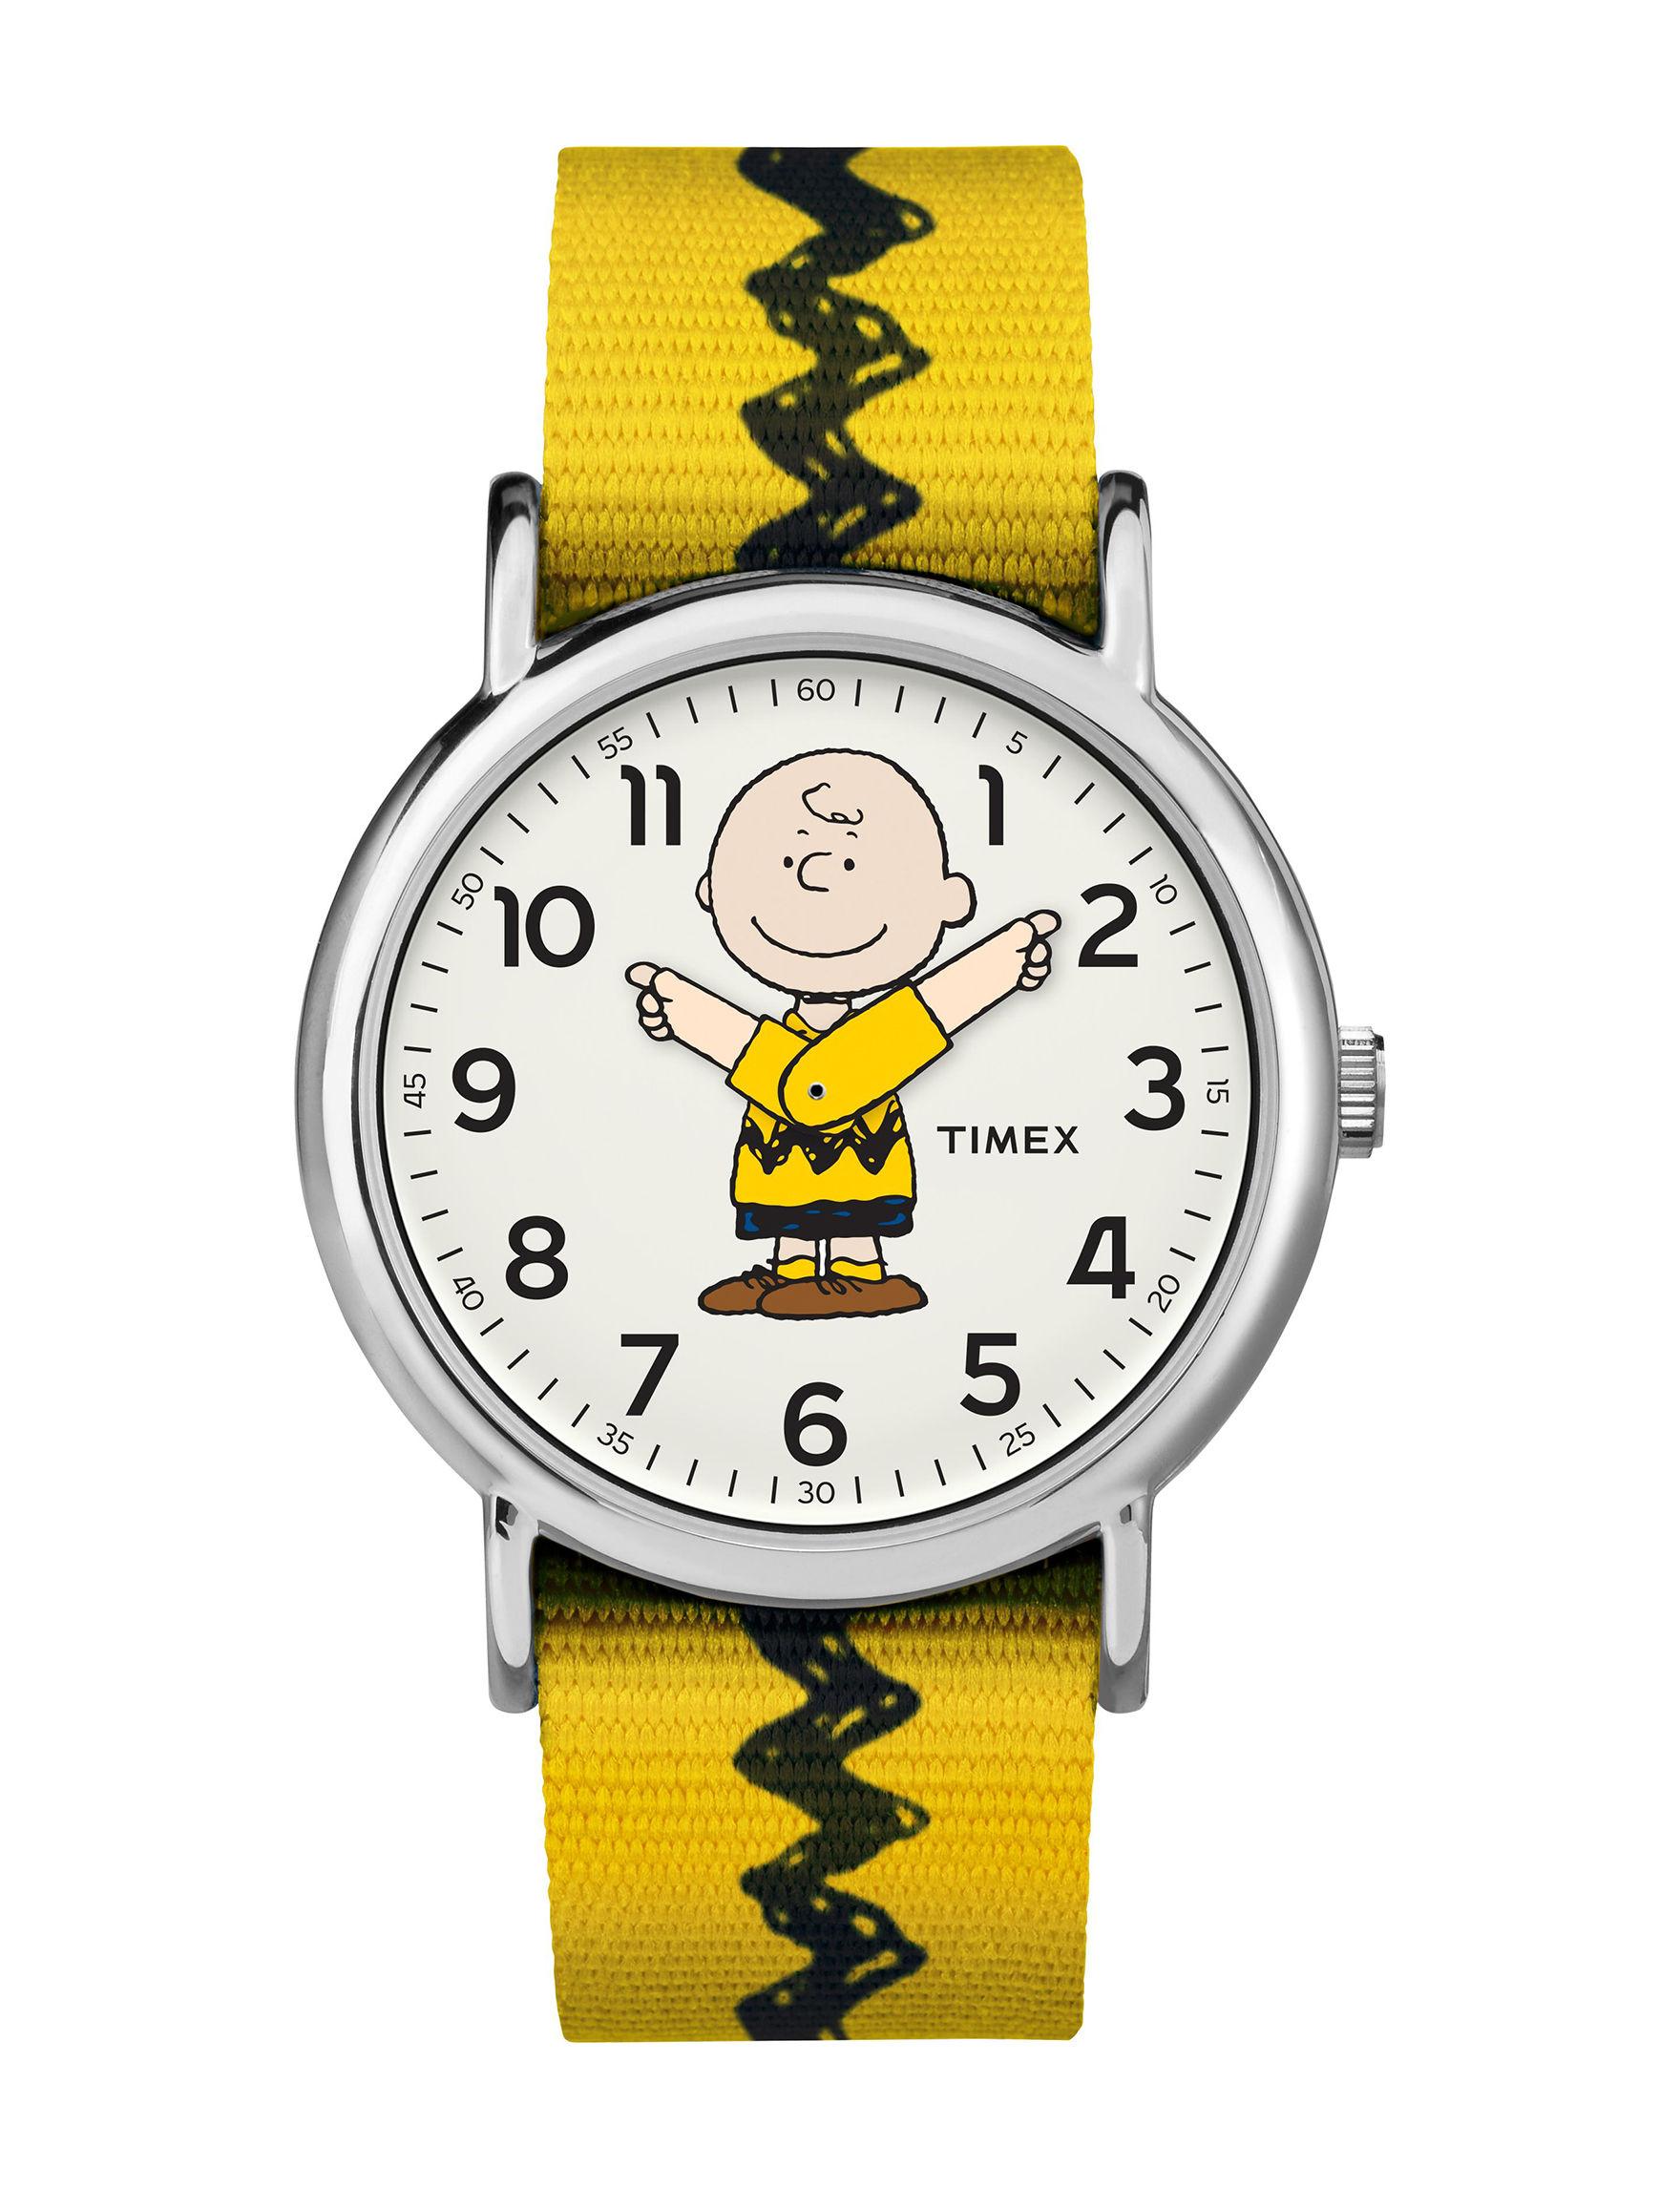 Timex Yellow Fashion Watches